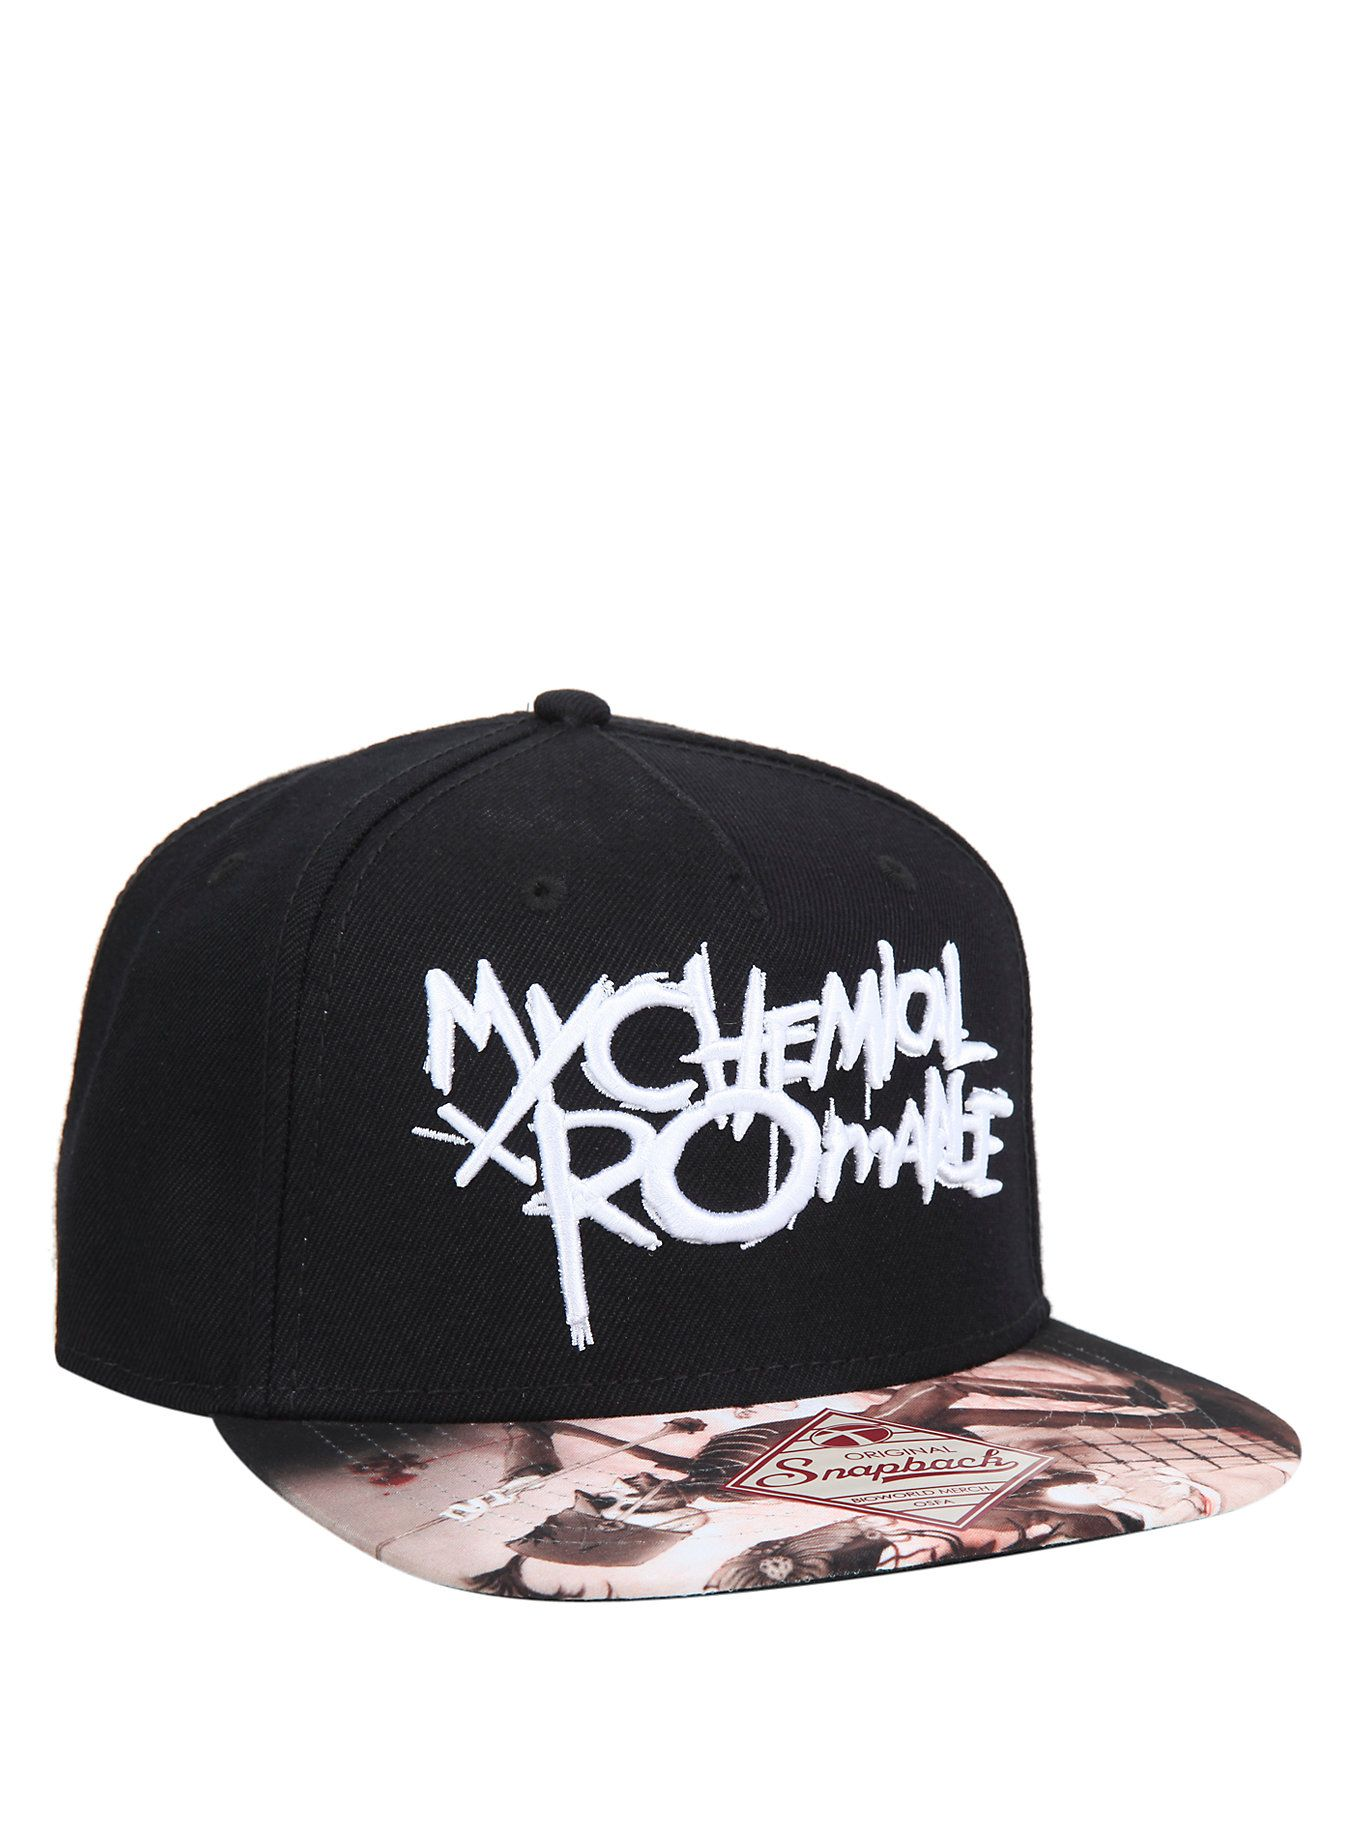 My Chemical Romance Snapback Hat  8b5719633ea7